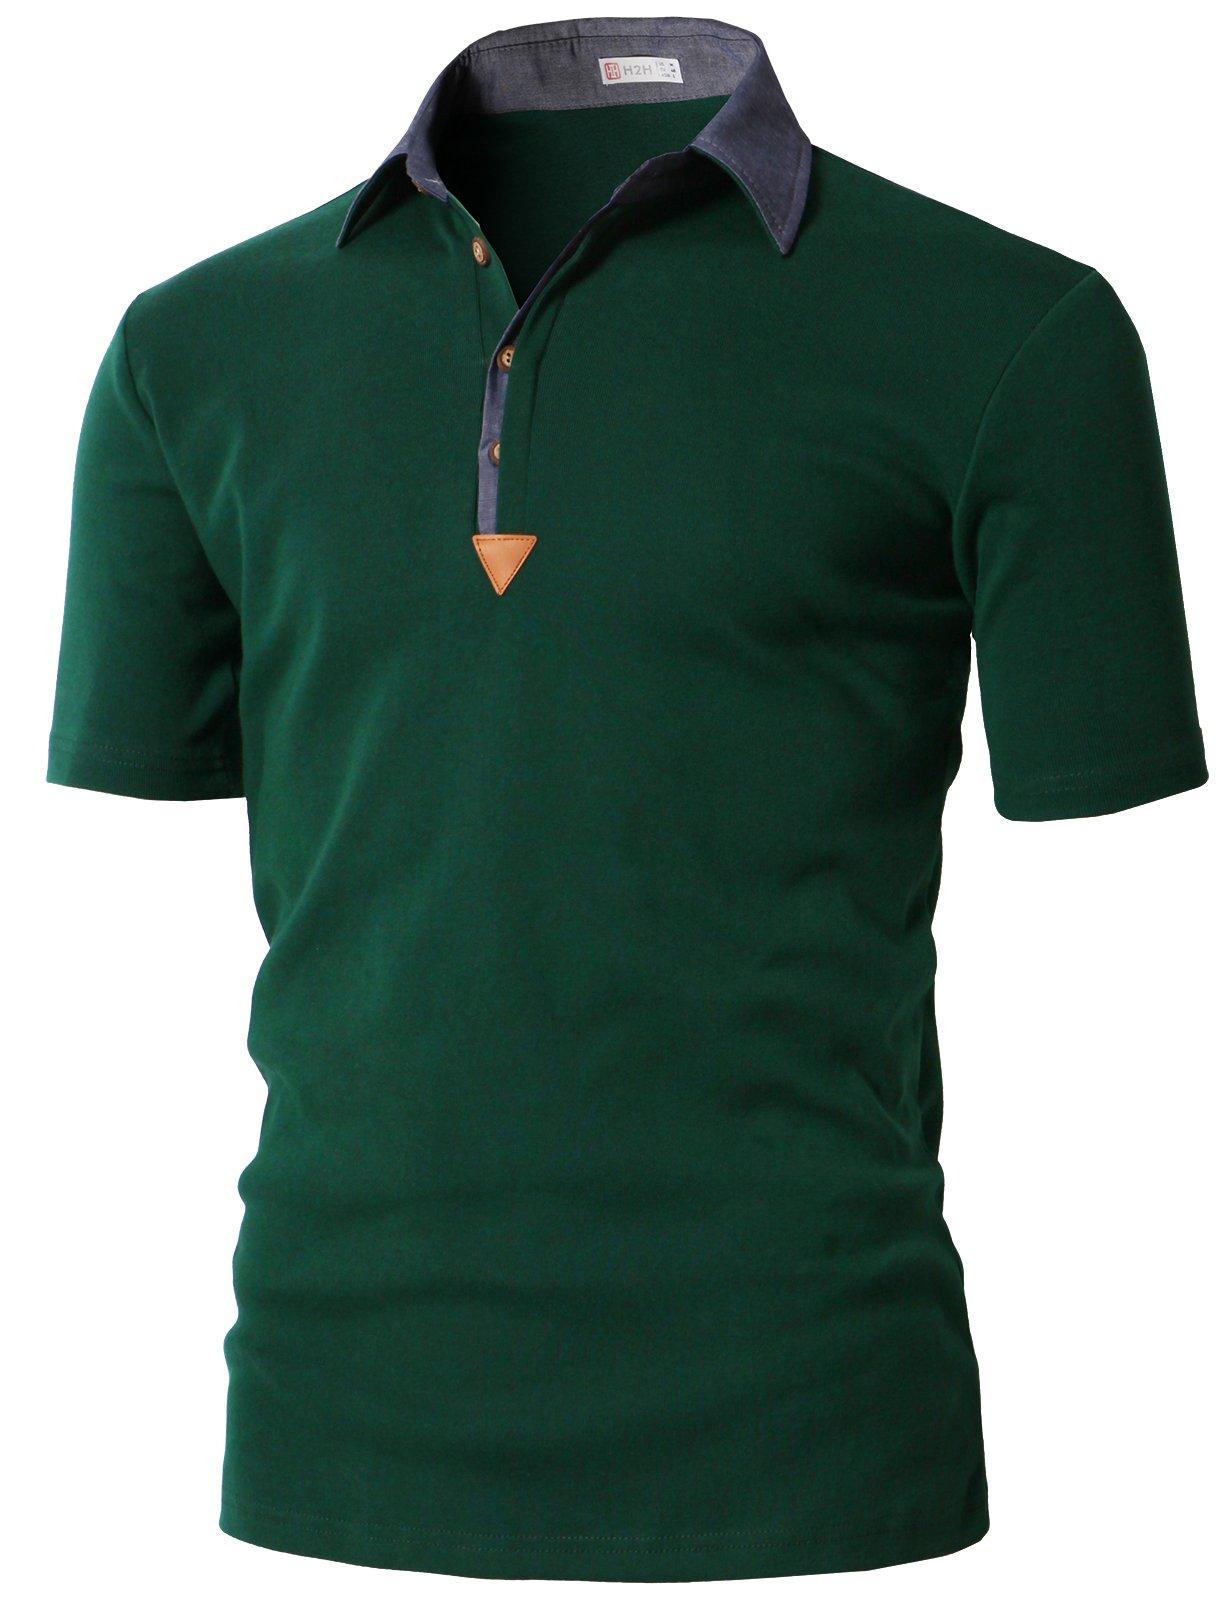 H2H Mens Engineered Stripe Polo Shirt Green US L/Asia XL (KMTTS0553)